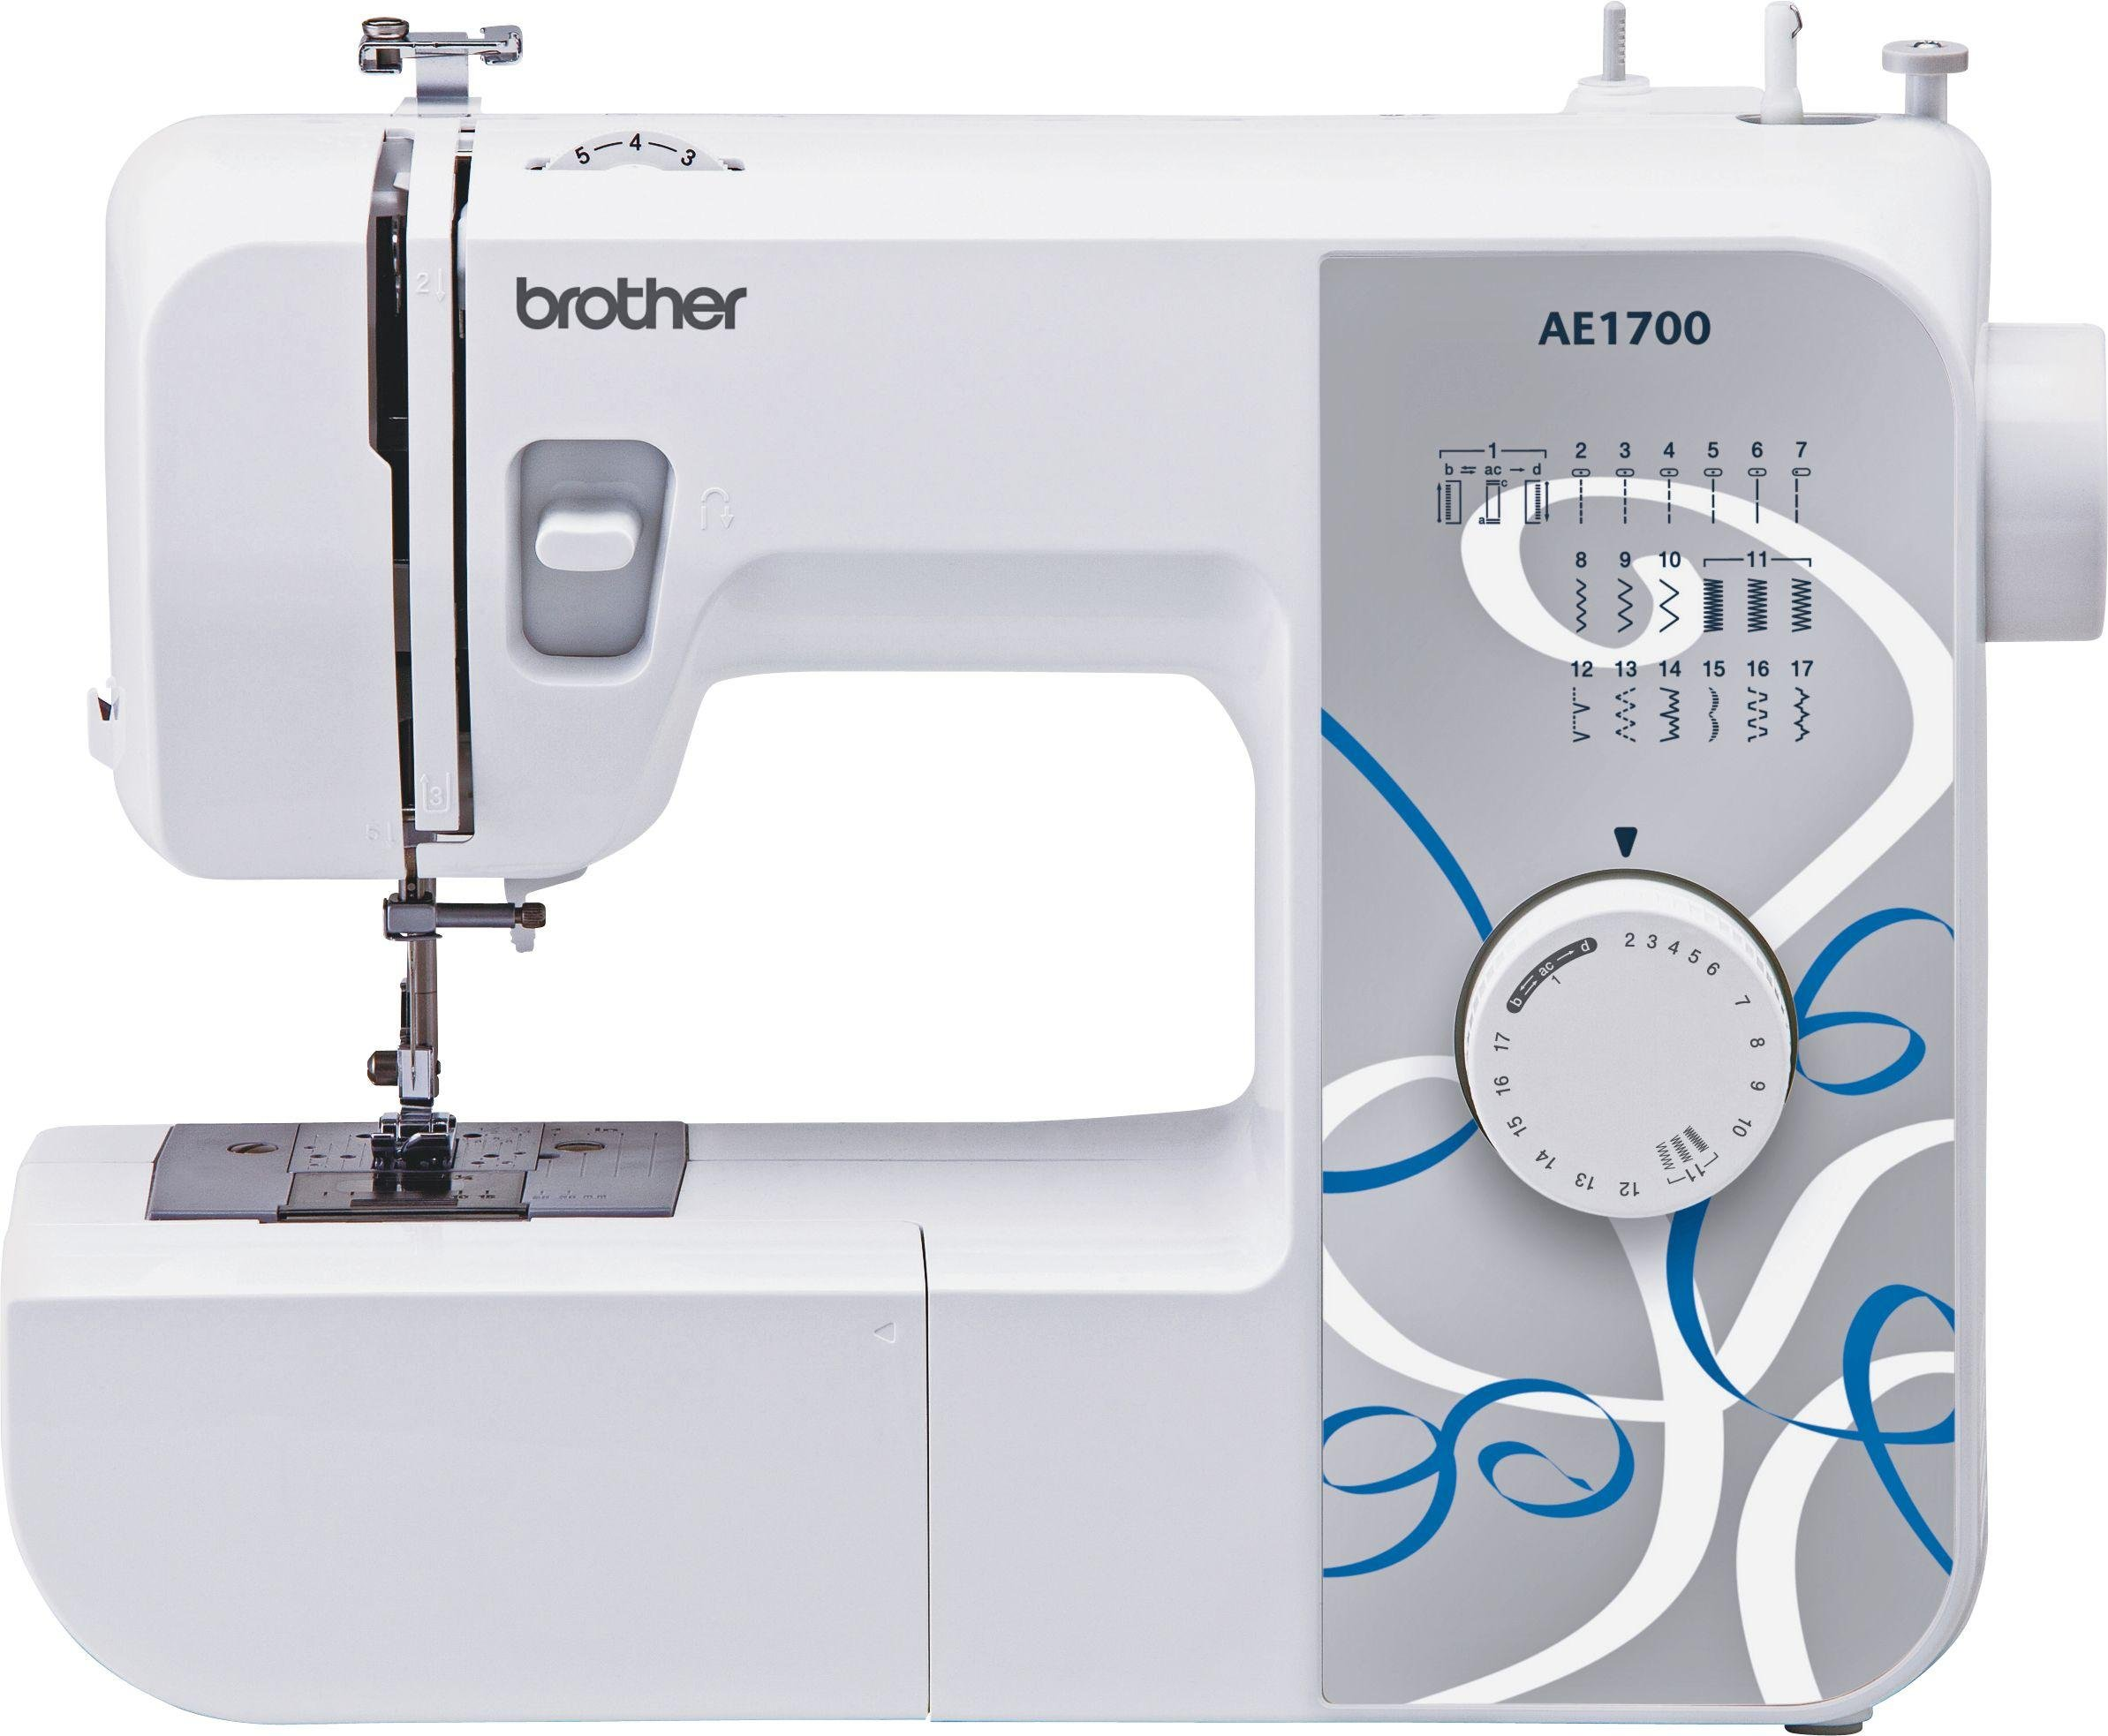 Brother AE1700 Stitch Sewing Machine